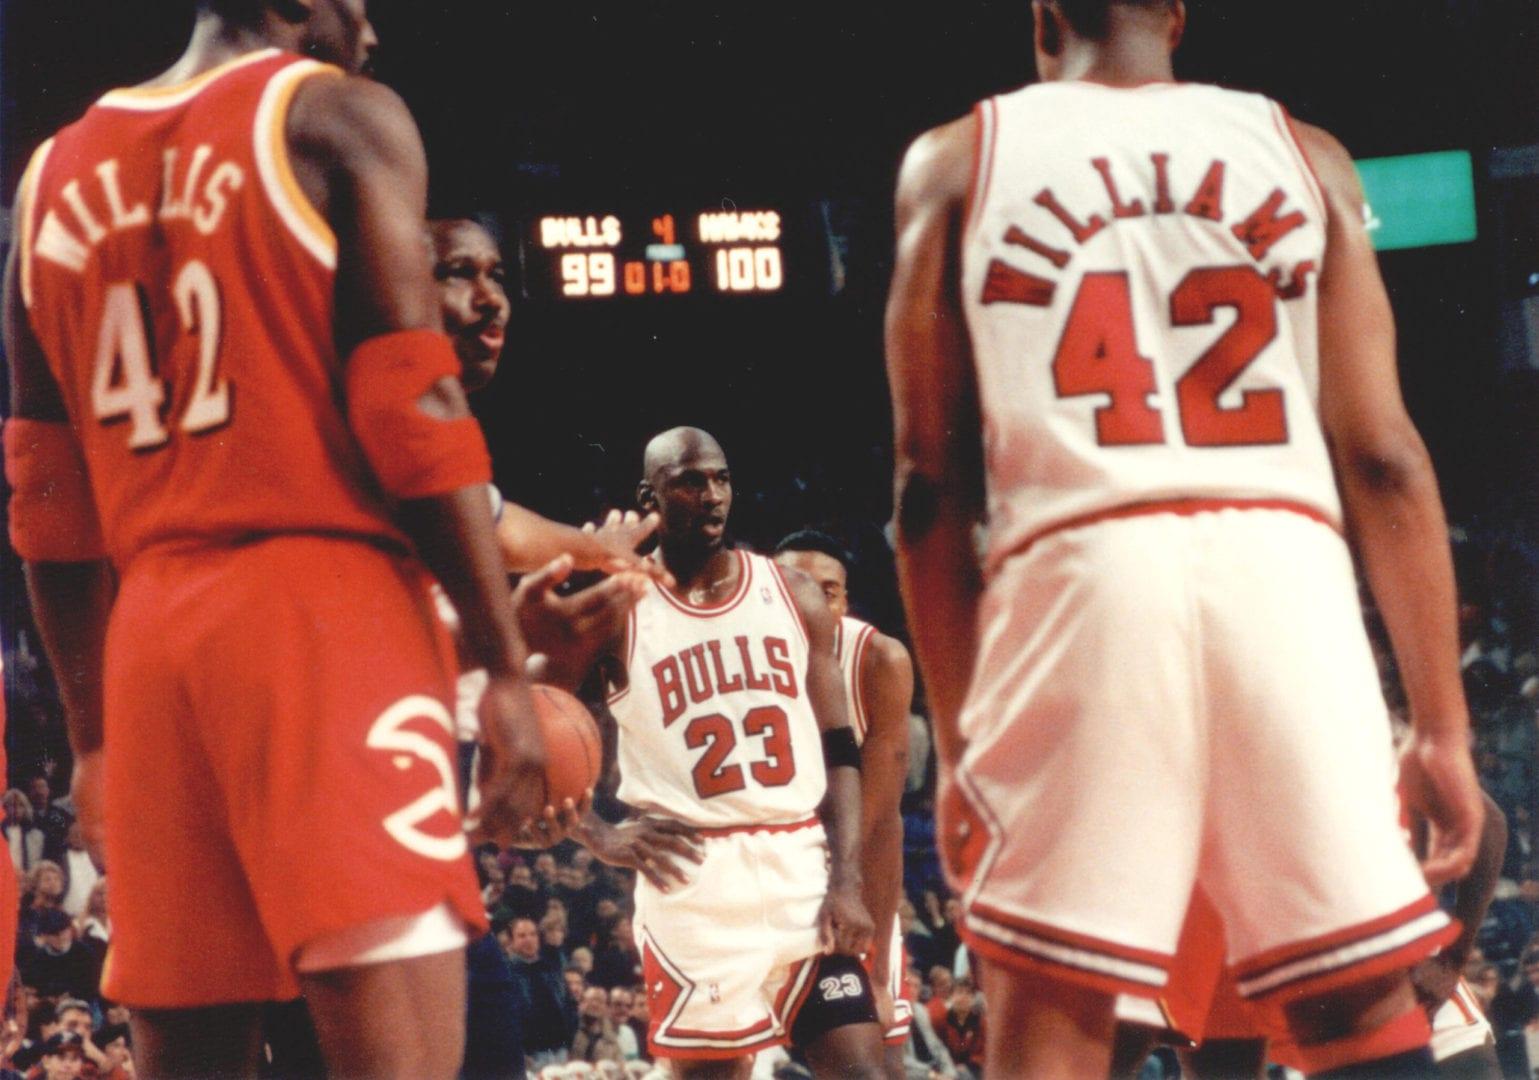 MJ standing among the players